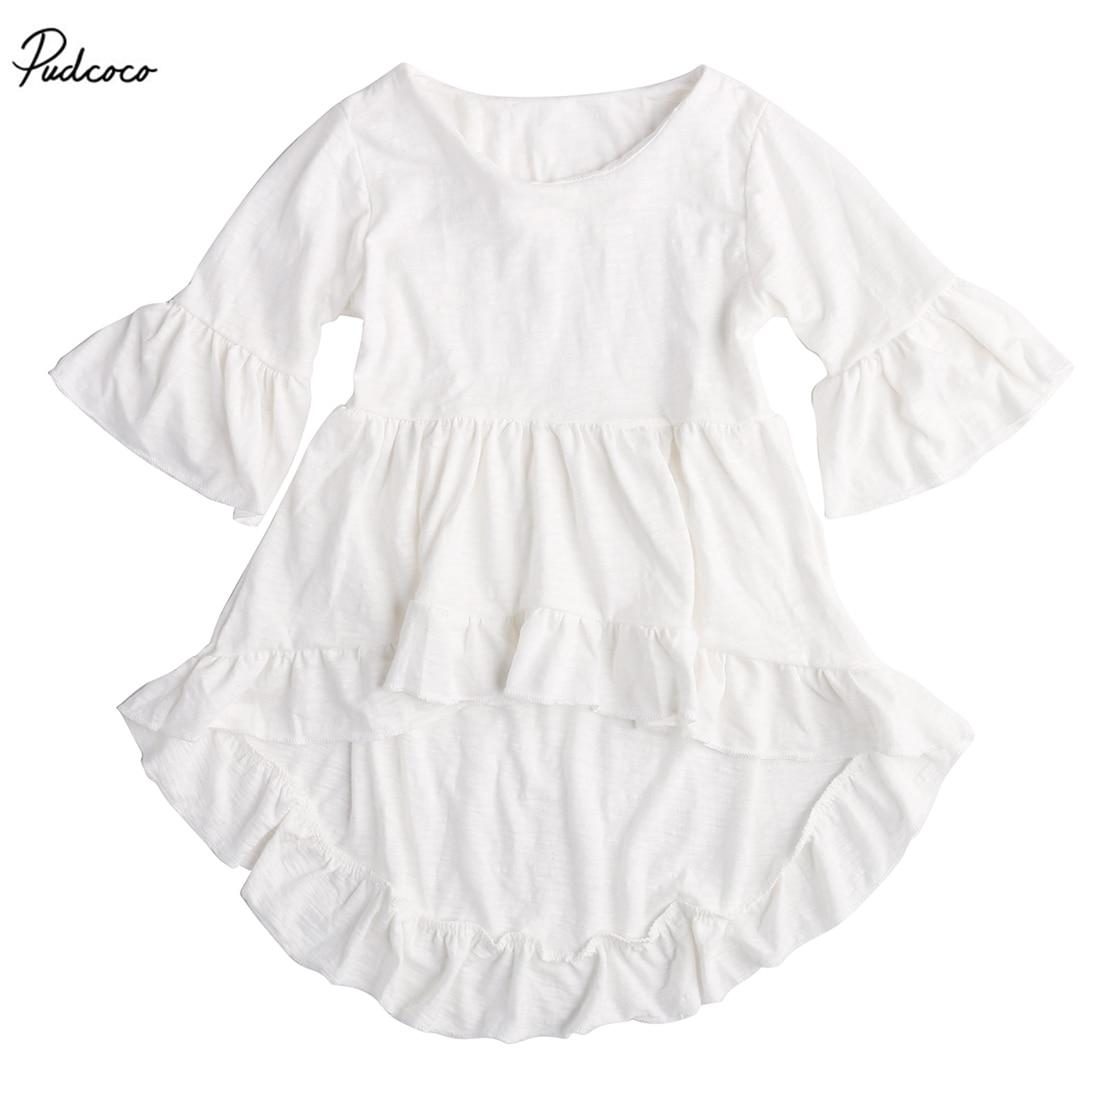 Baby Girls Asymmetrical Dress 2017 New Summer Frills Flare Sleeve Party Ruffles Hem Dresses 1-6Y